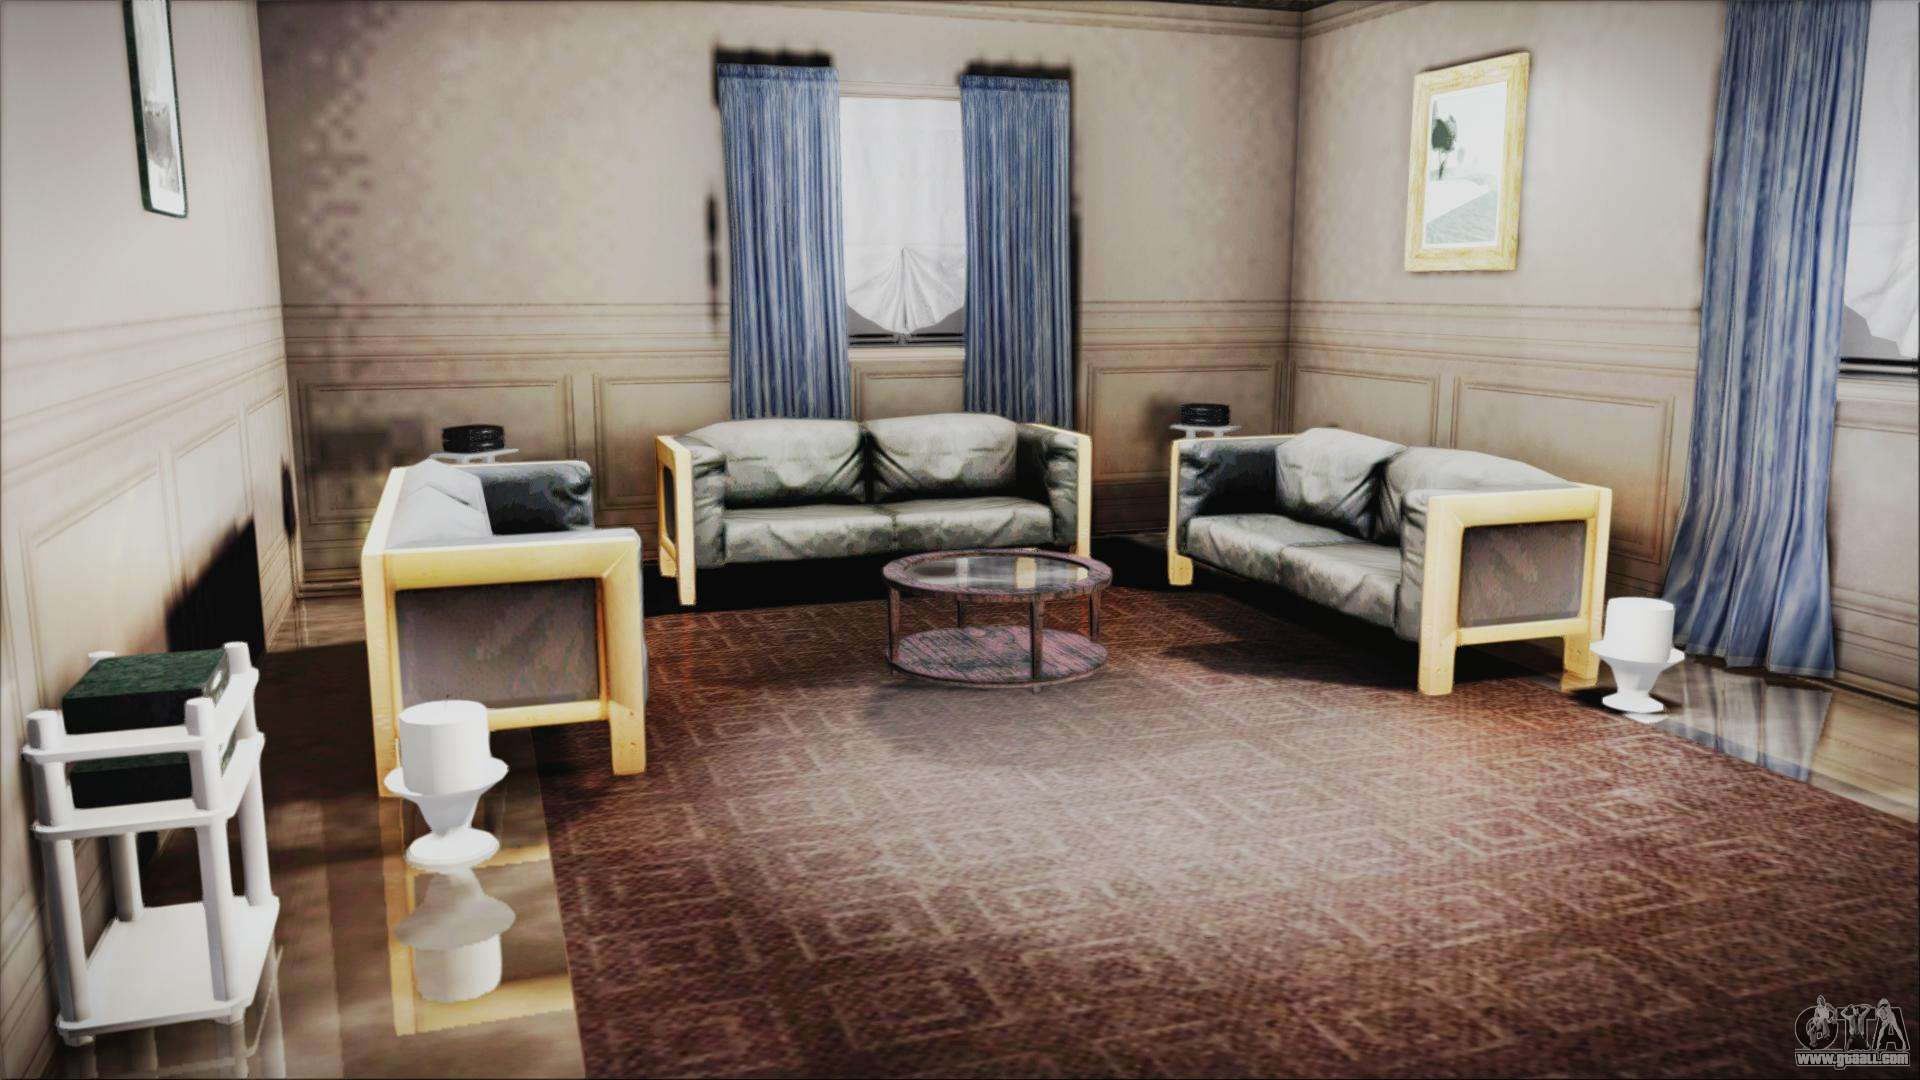 Cj house new interior for gta san andreas - New homes interior ...